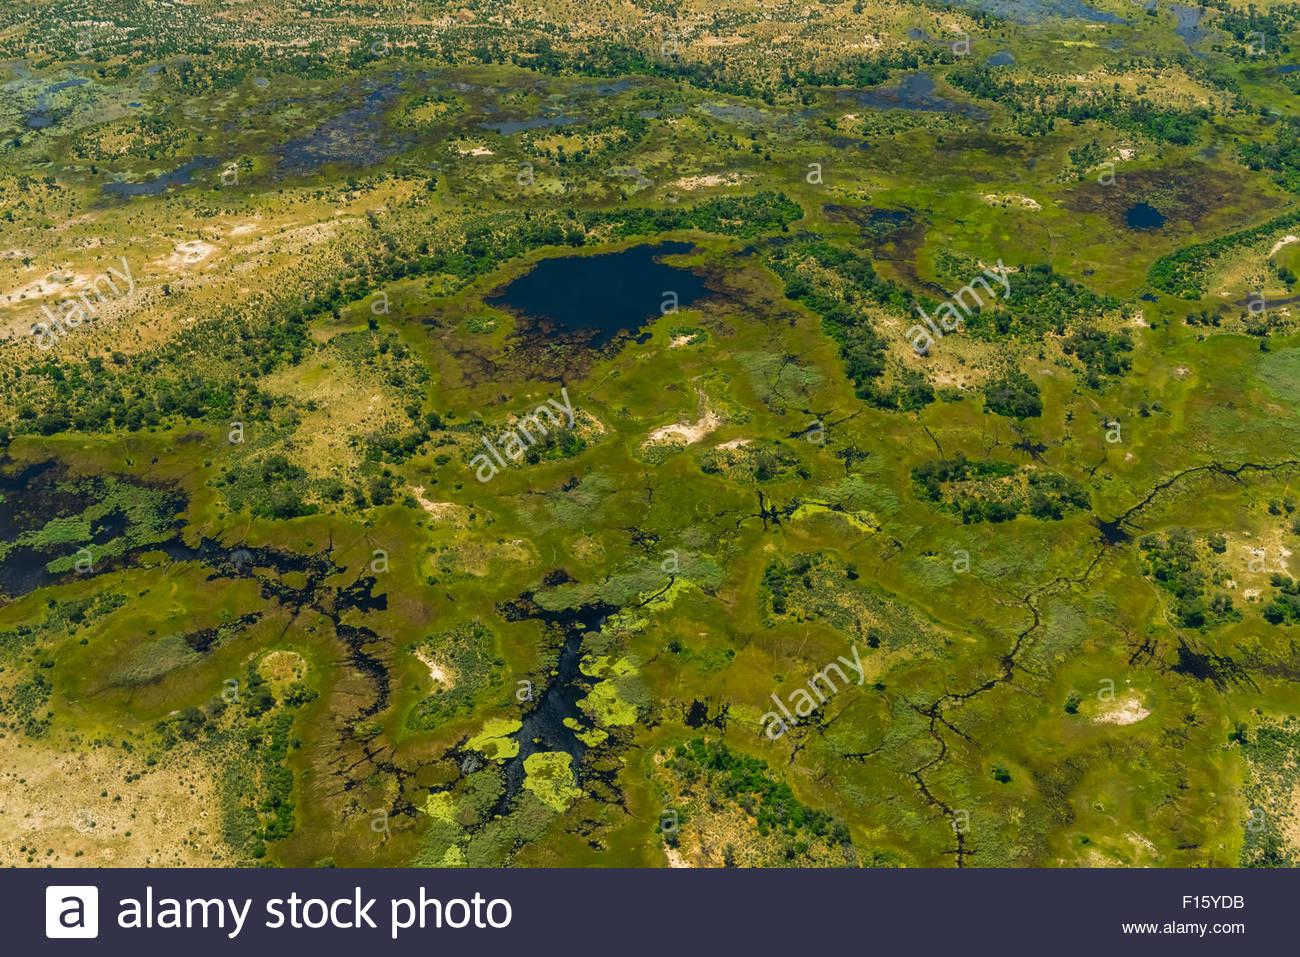 Aerial views on flight from Okavango Delta to Maun, Botswana. - Stock Image